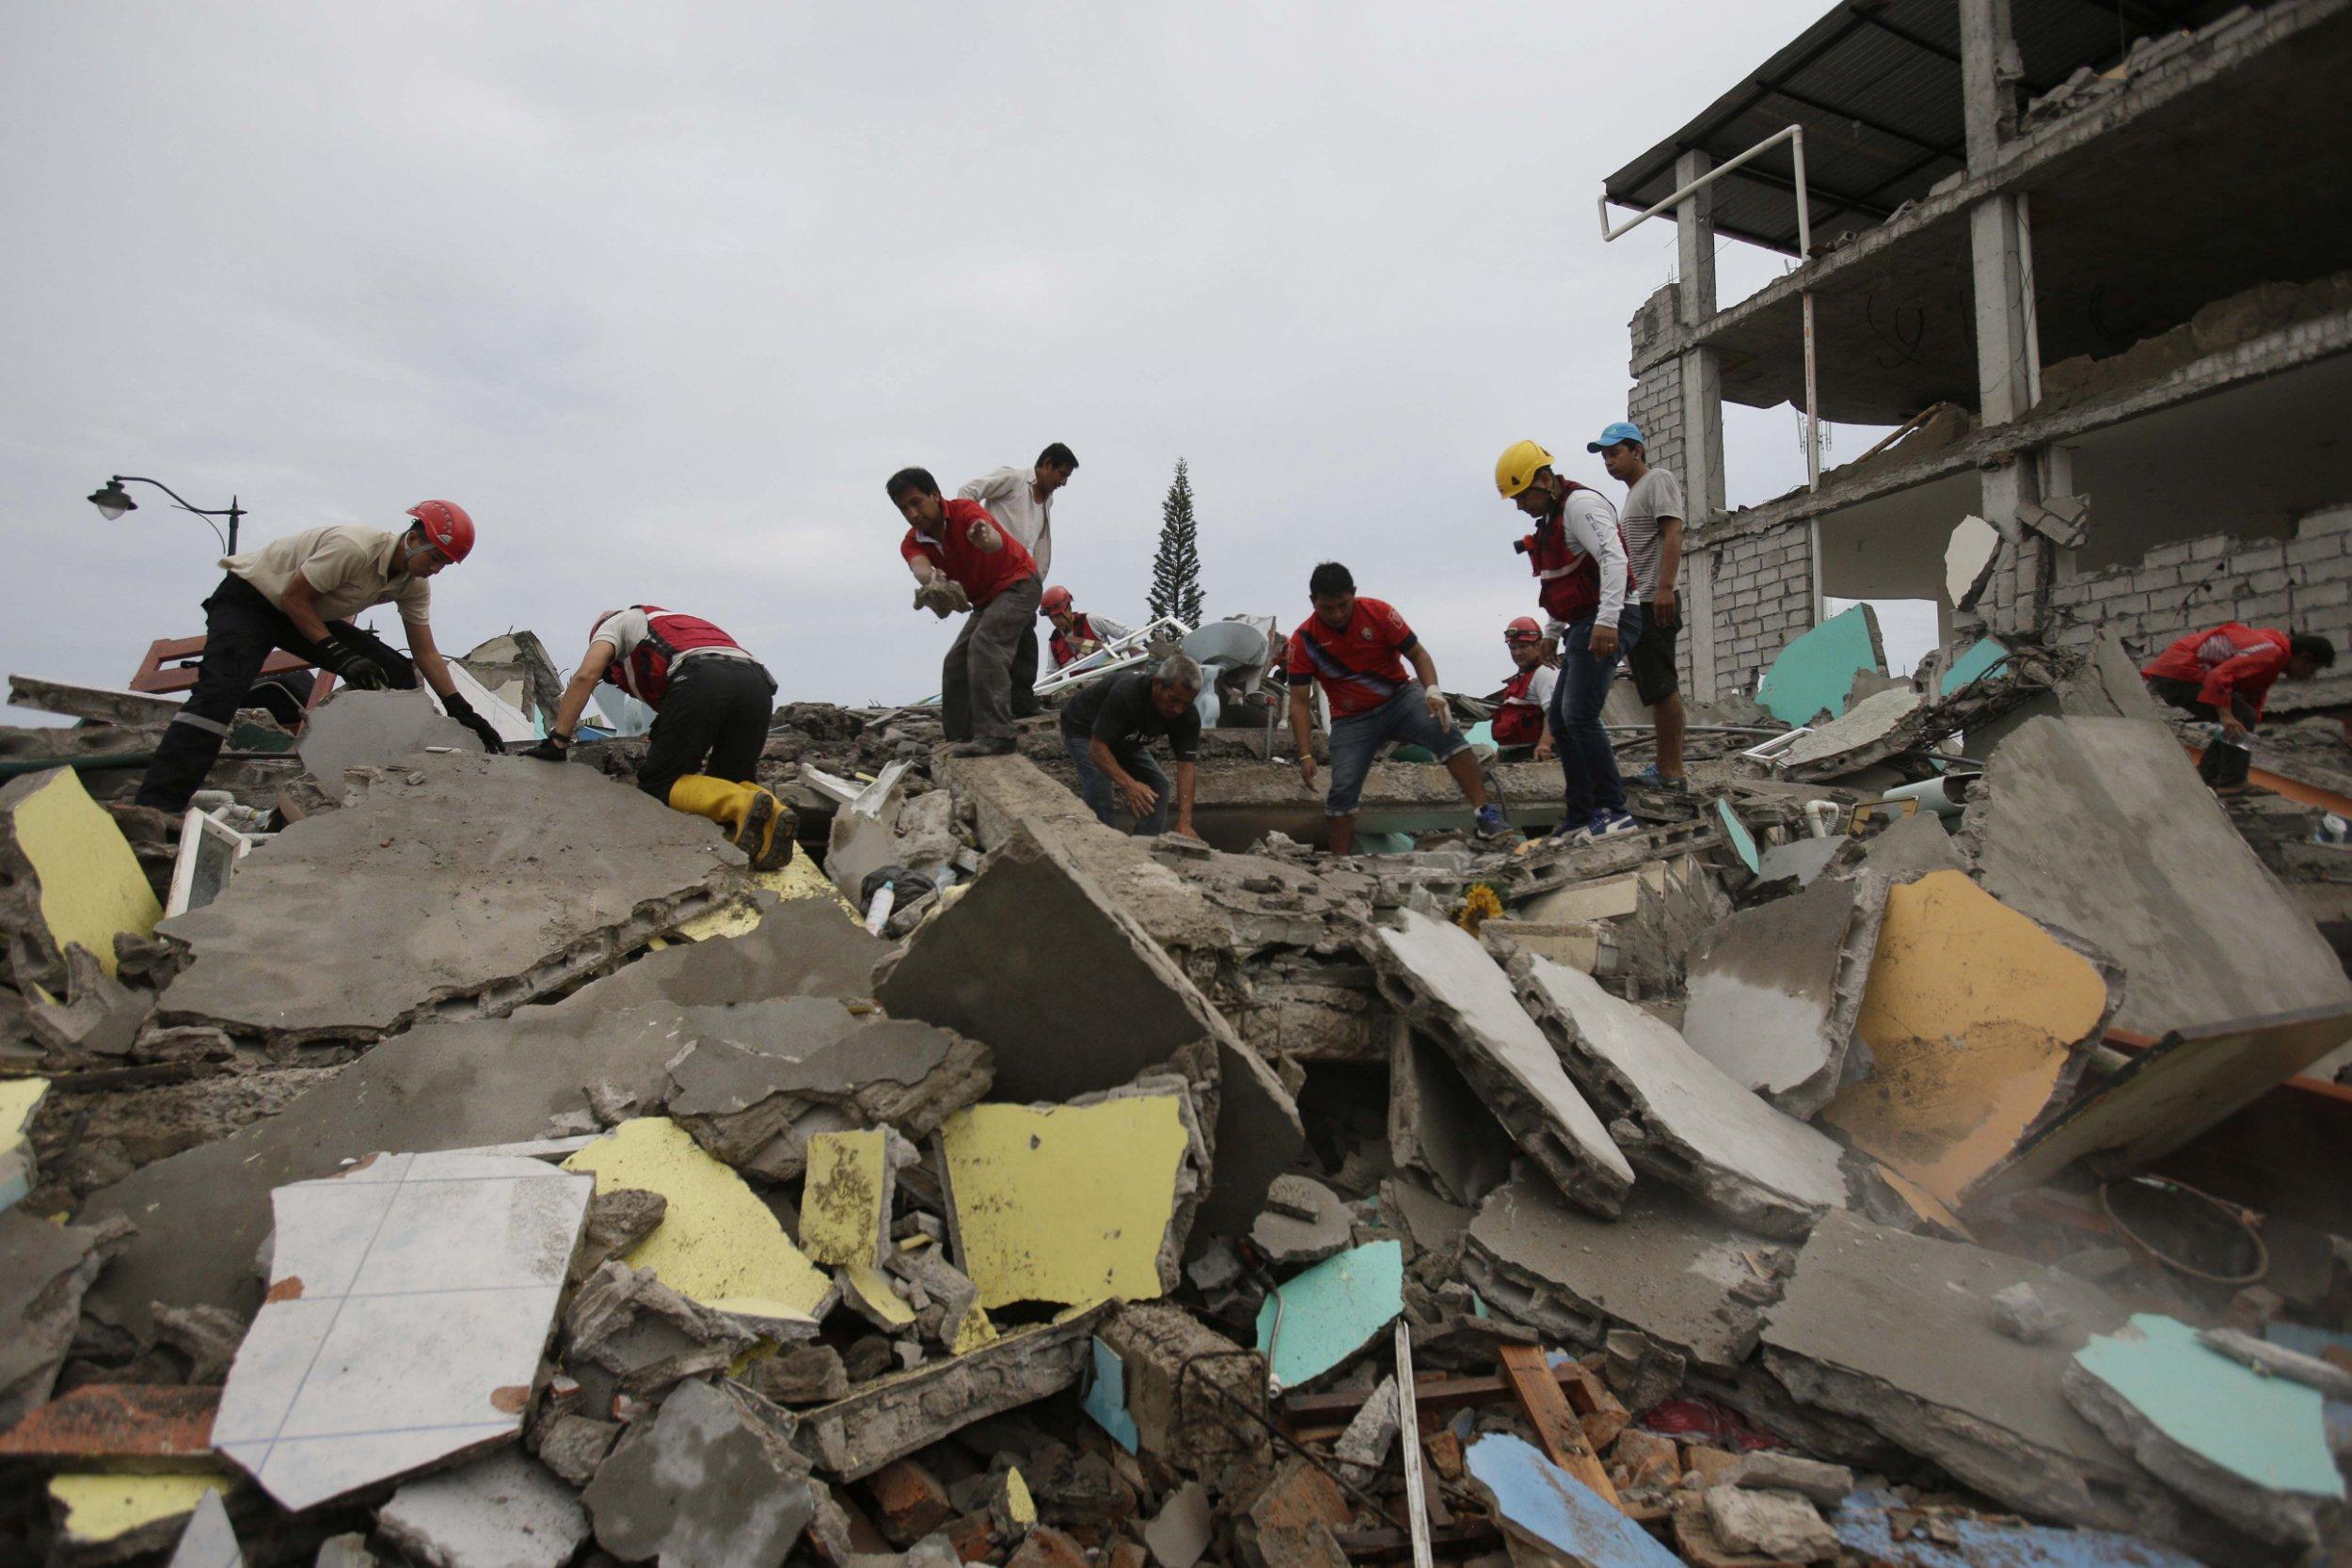 Ecuador earthquake death toll jumps as daylight reveals scale of devastation